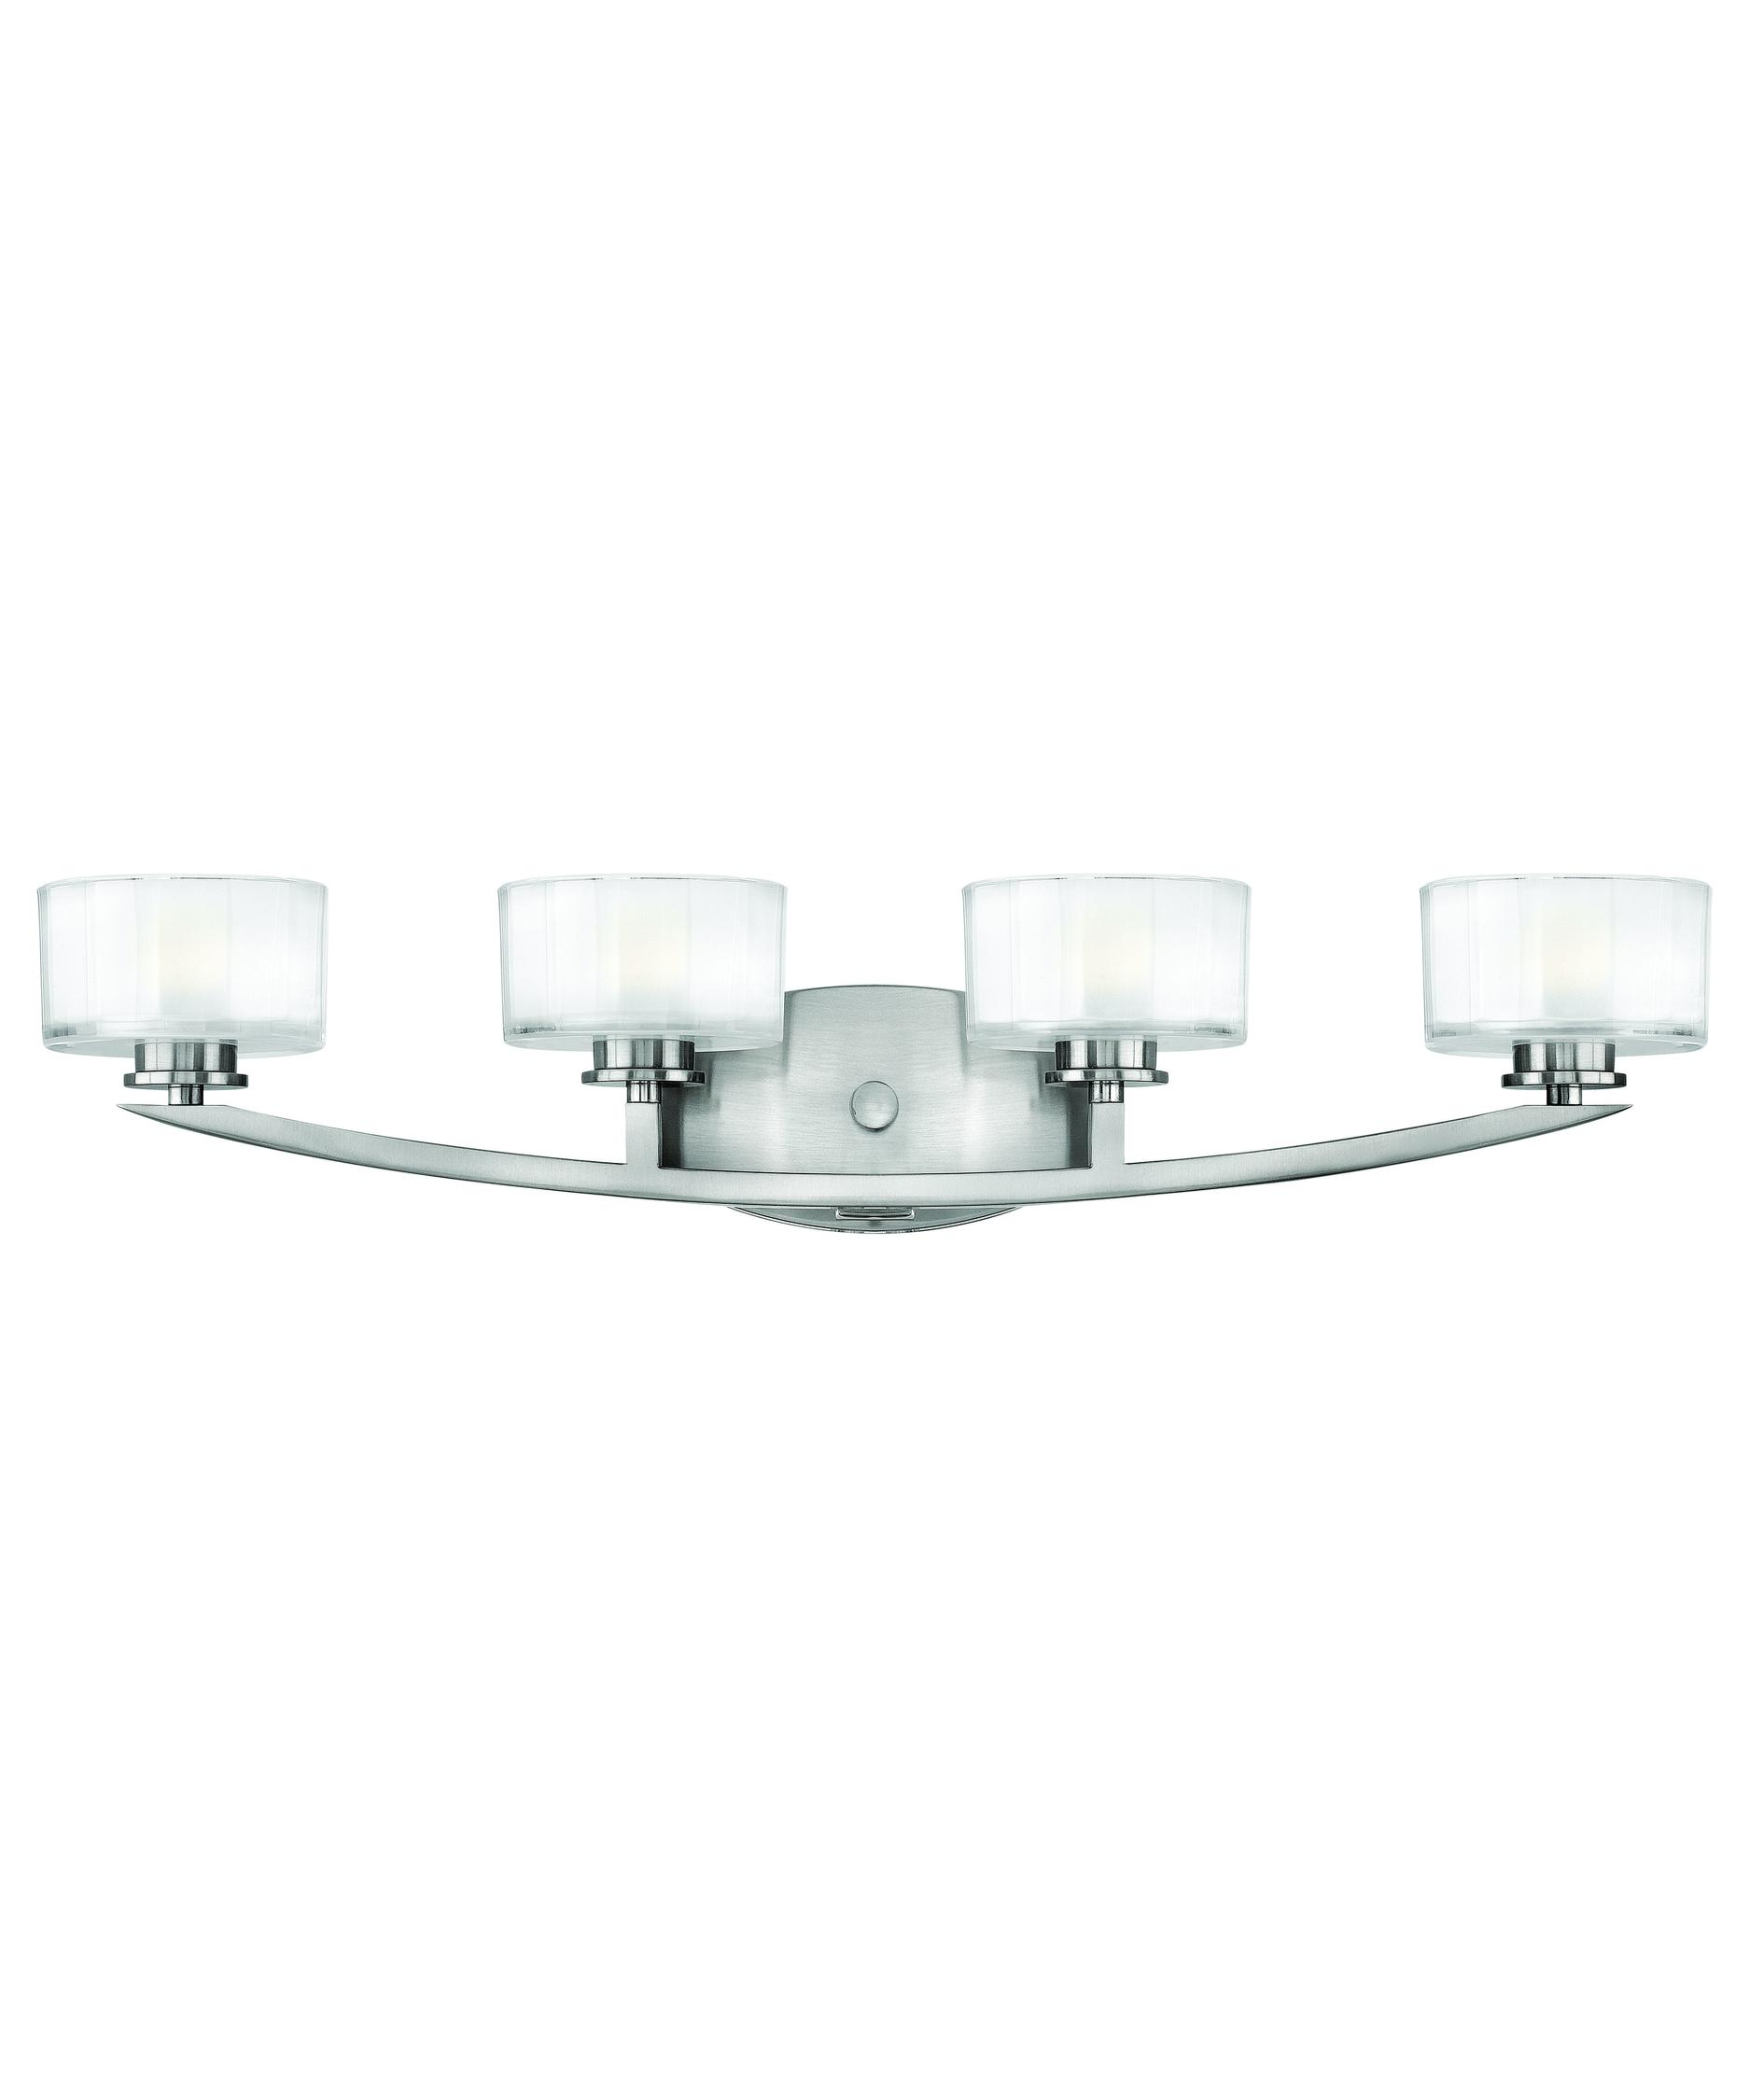 Hinkley Lighting 5594 Meridian 29 Inch Bath Vanity Light